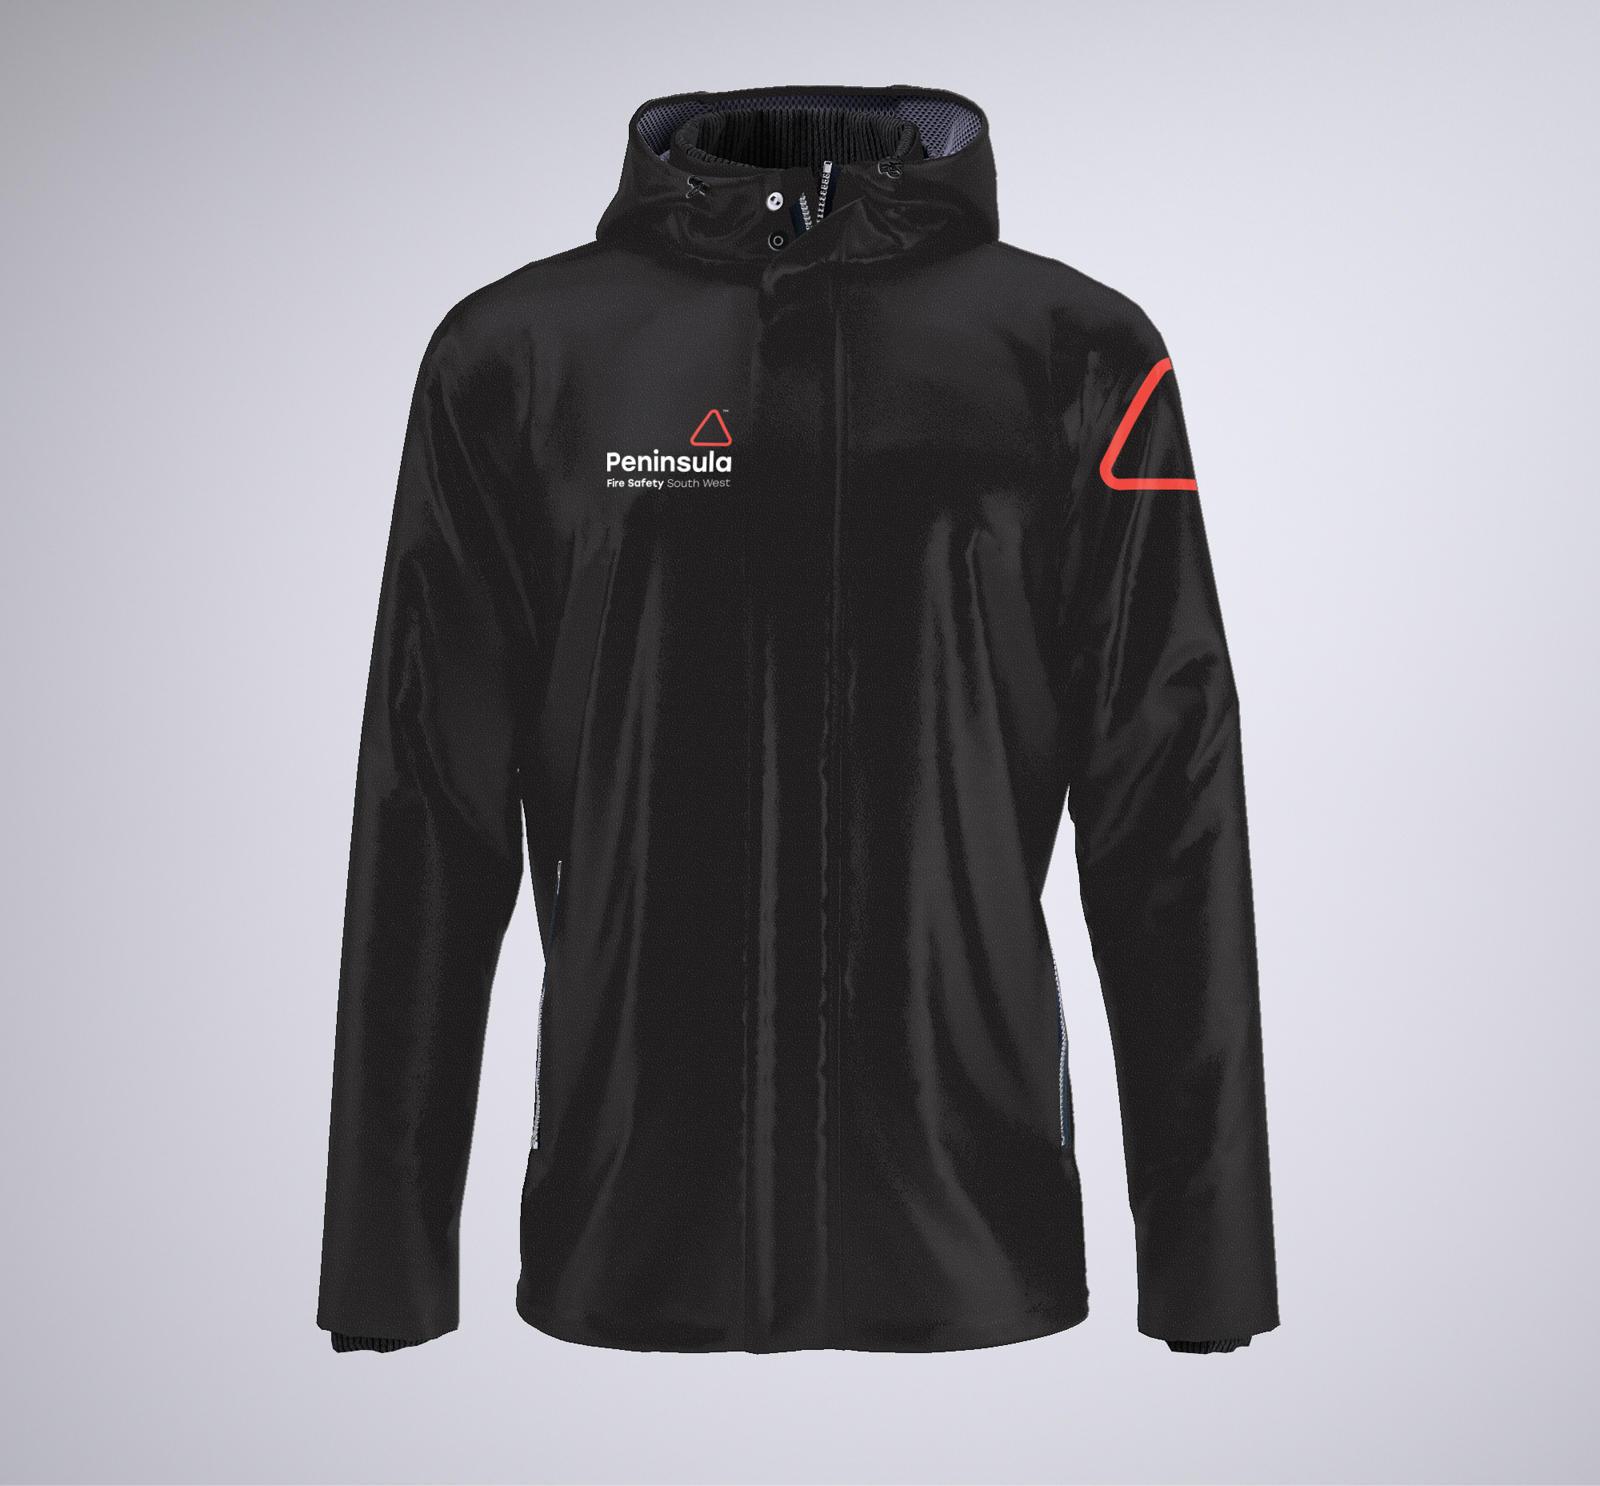 branding for business apparel